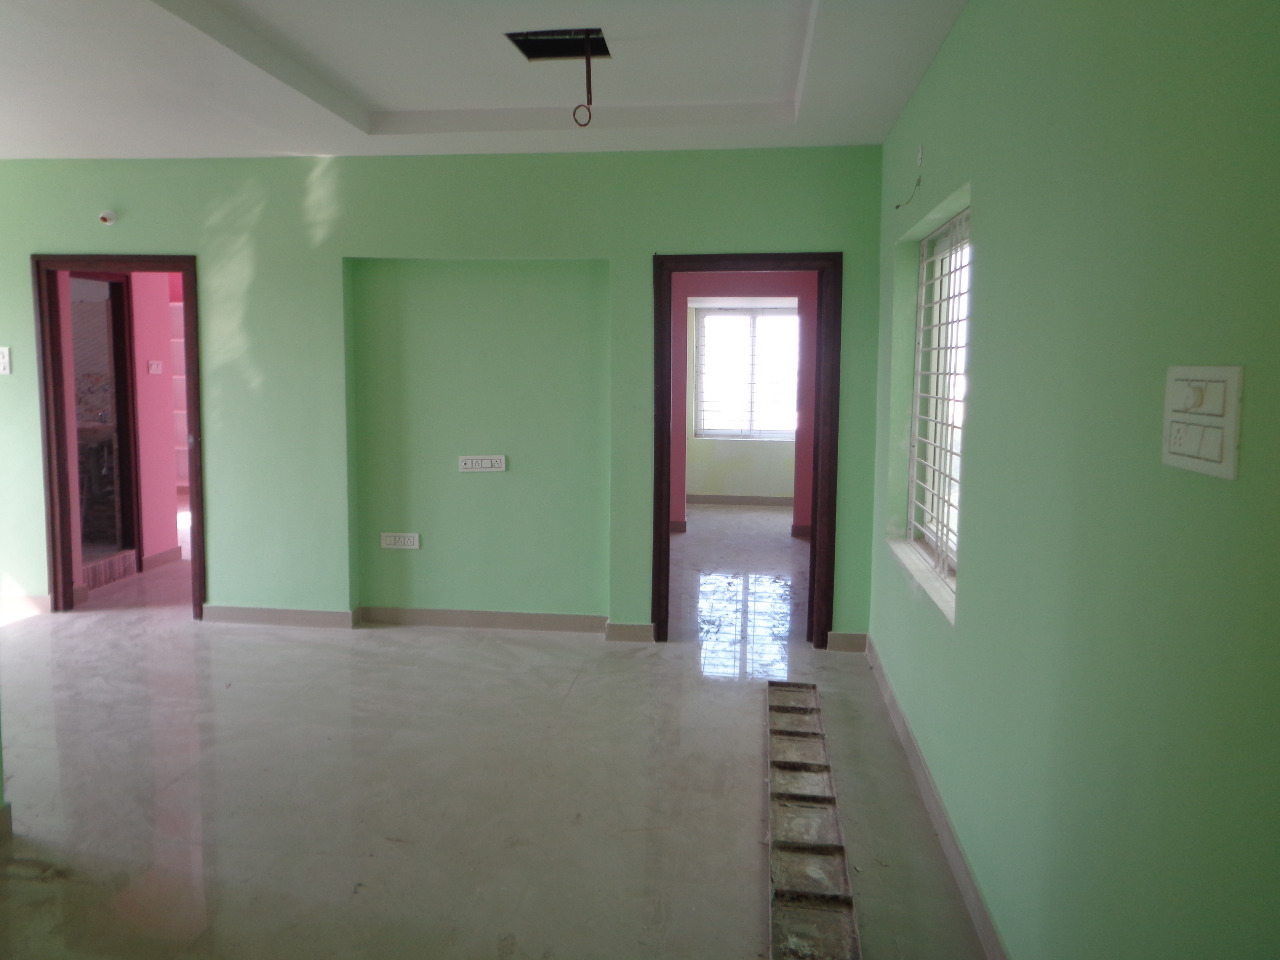 2BHK Flats for Rent at Pallamraju Nagar West, Kakinada